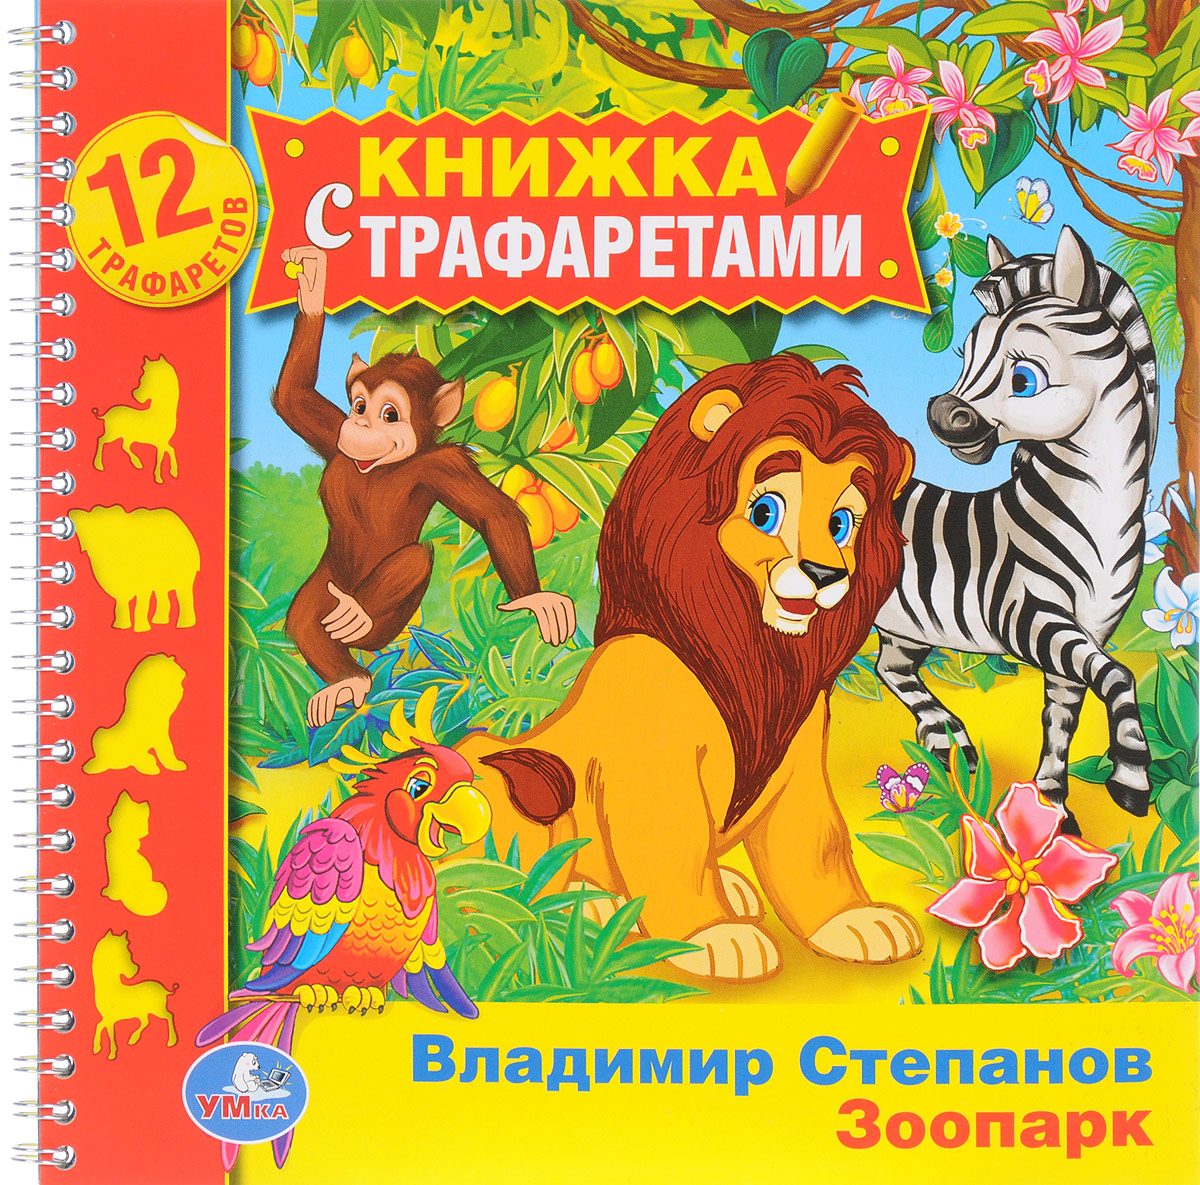 Зоопарк (+ трафареты)